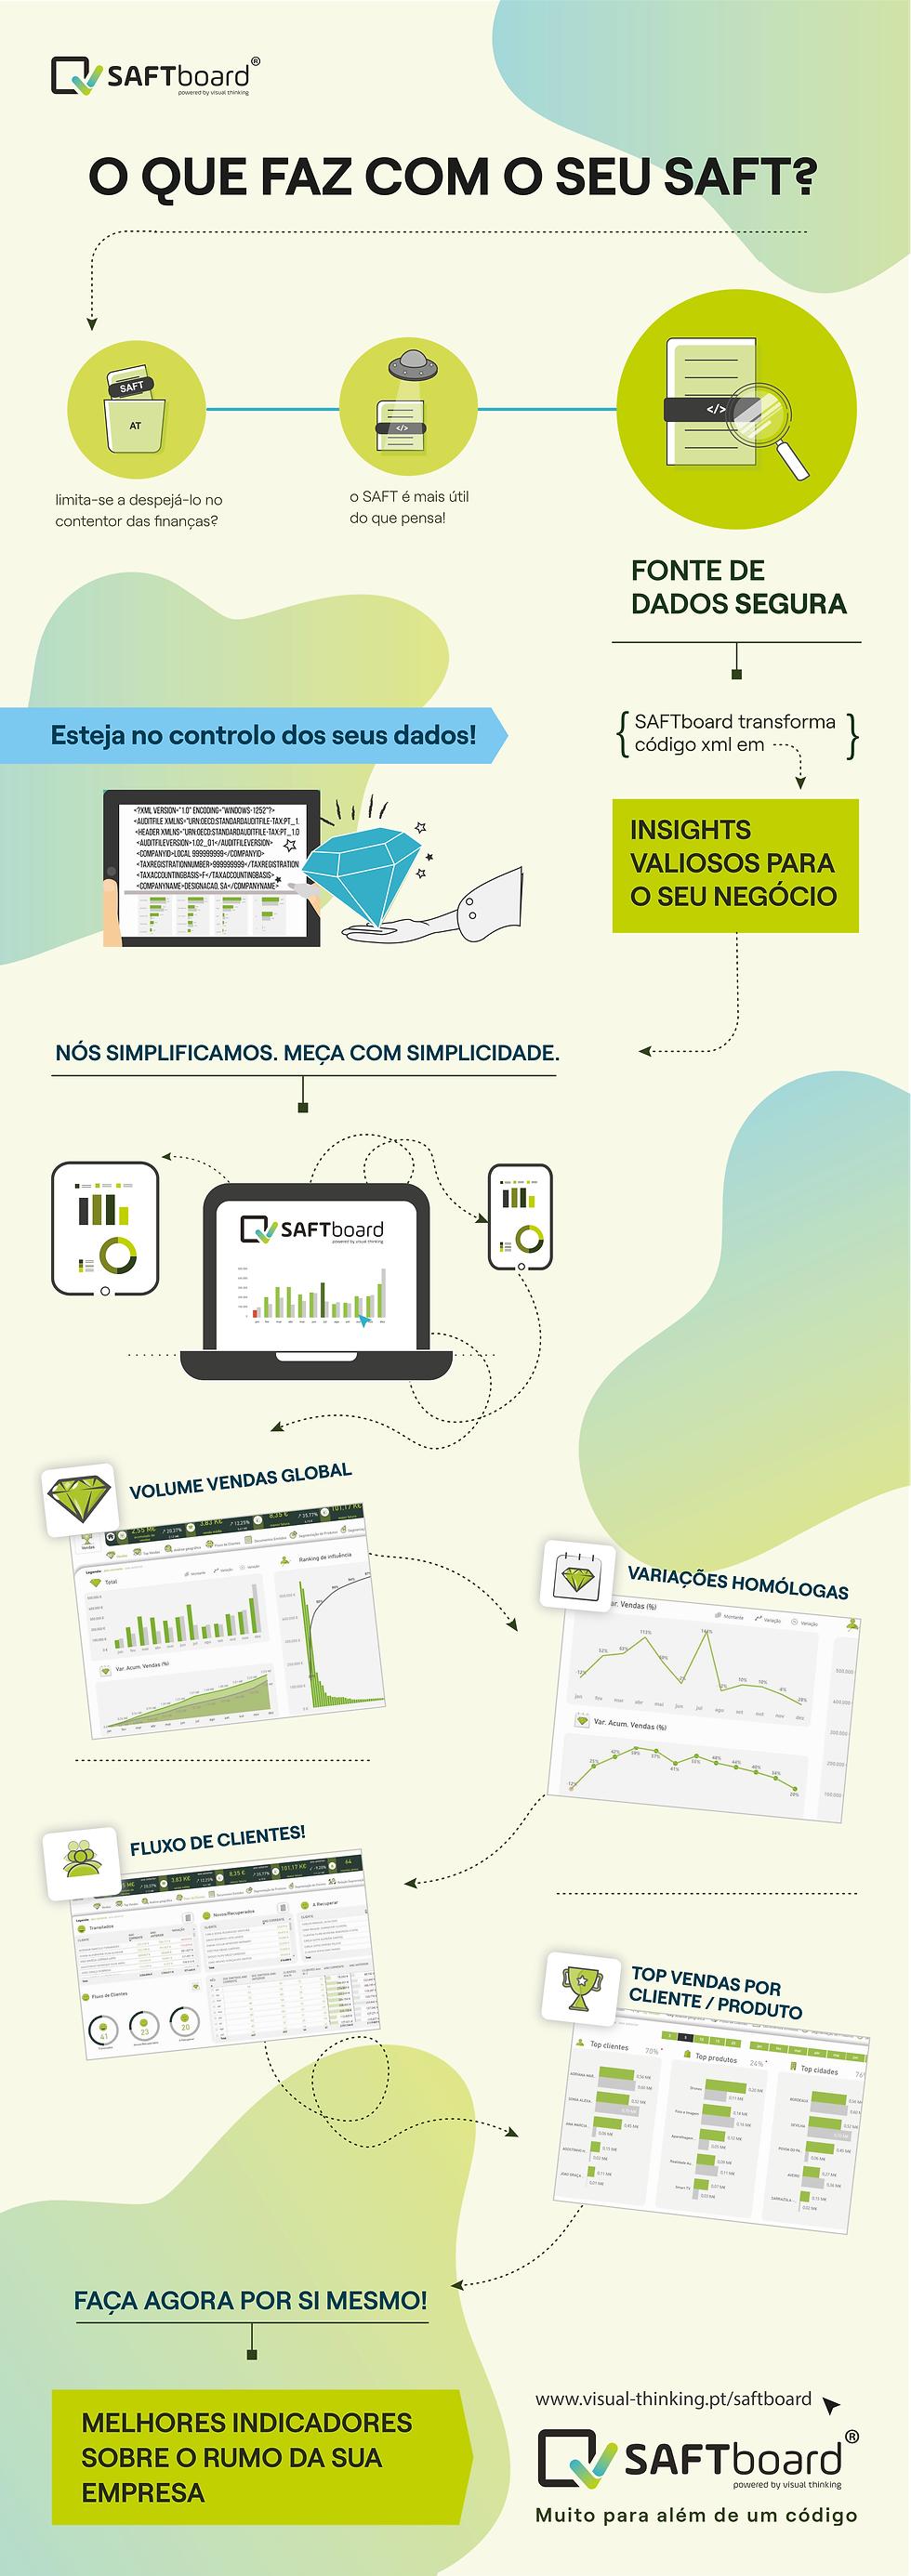 VT_SaftBoard_infographic_vfinal.png